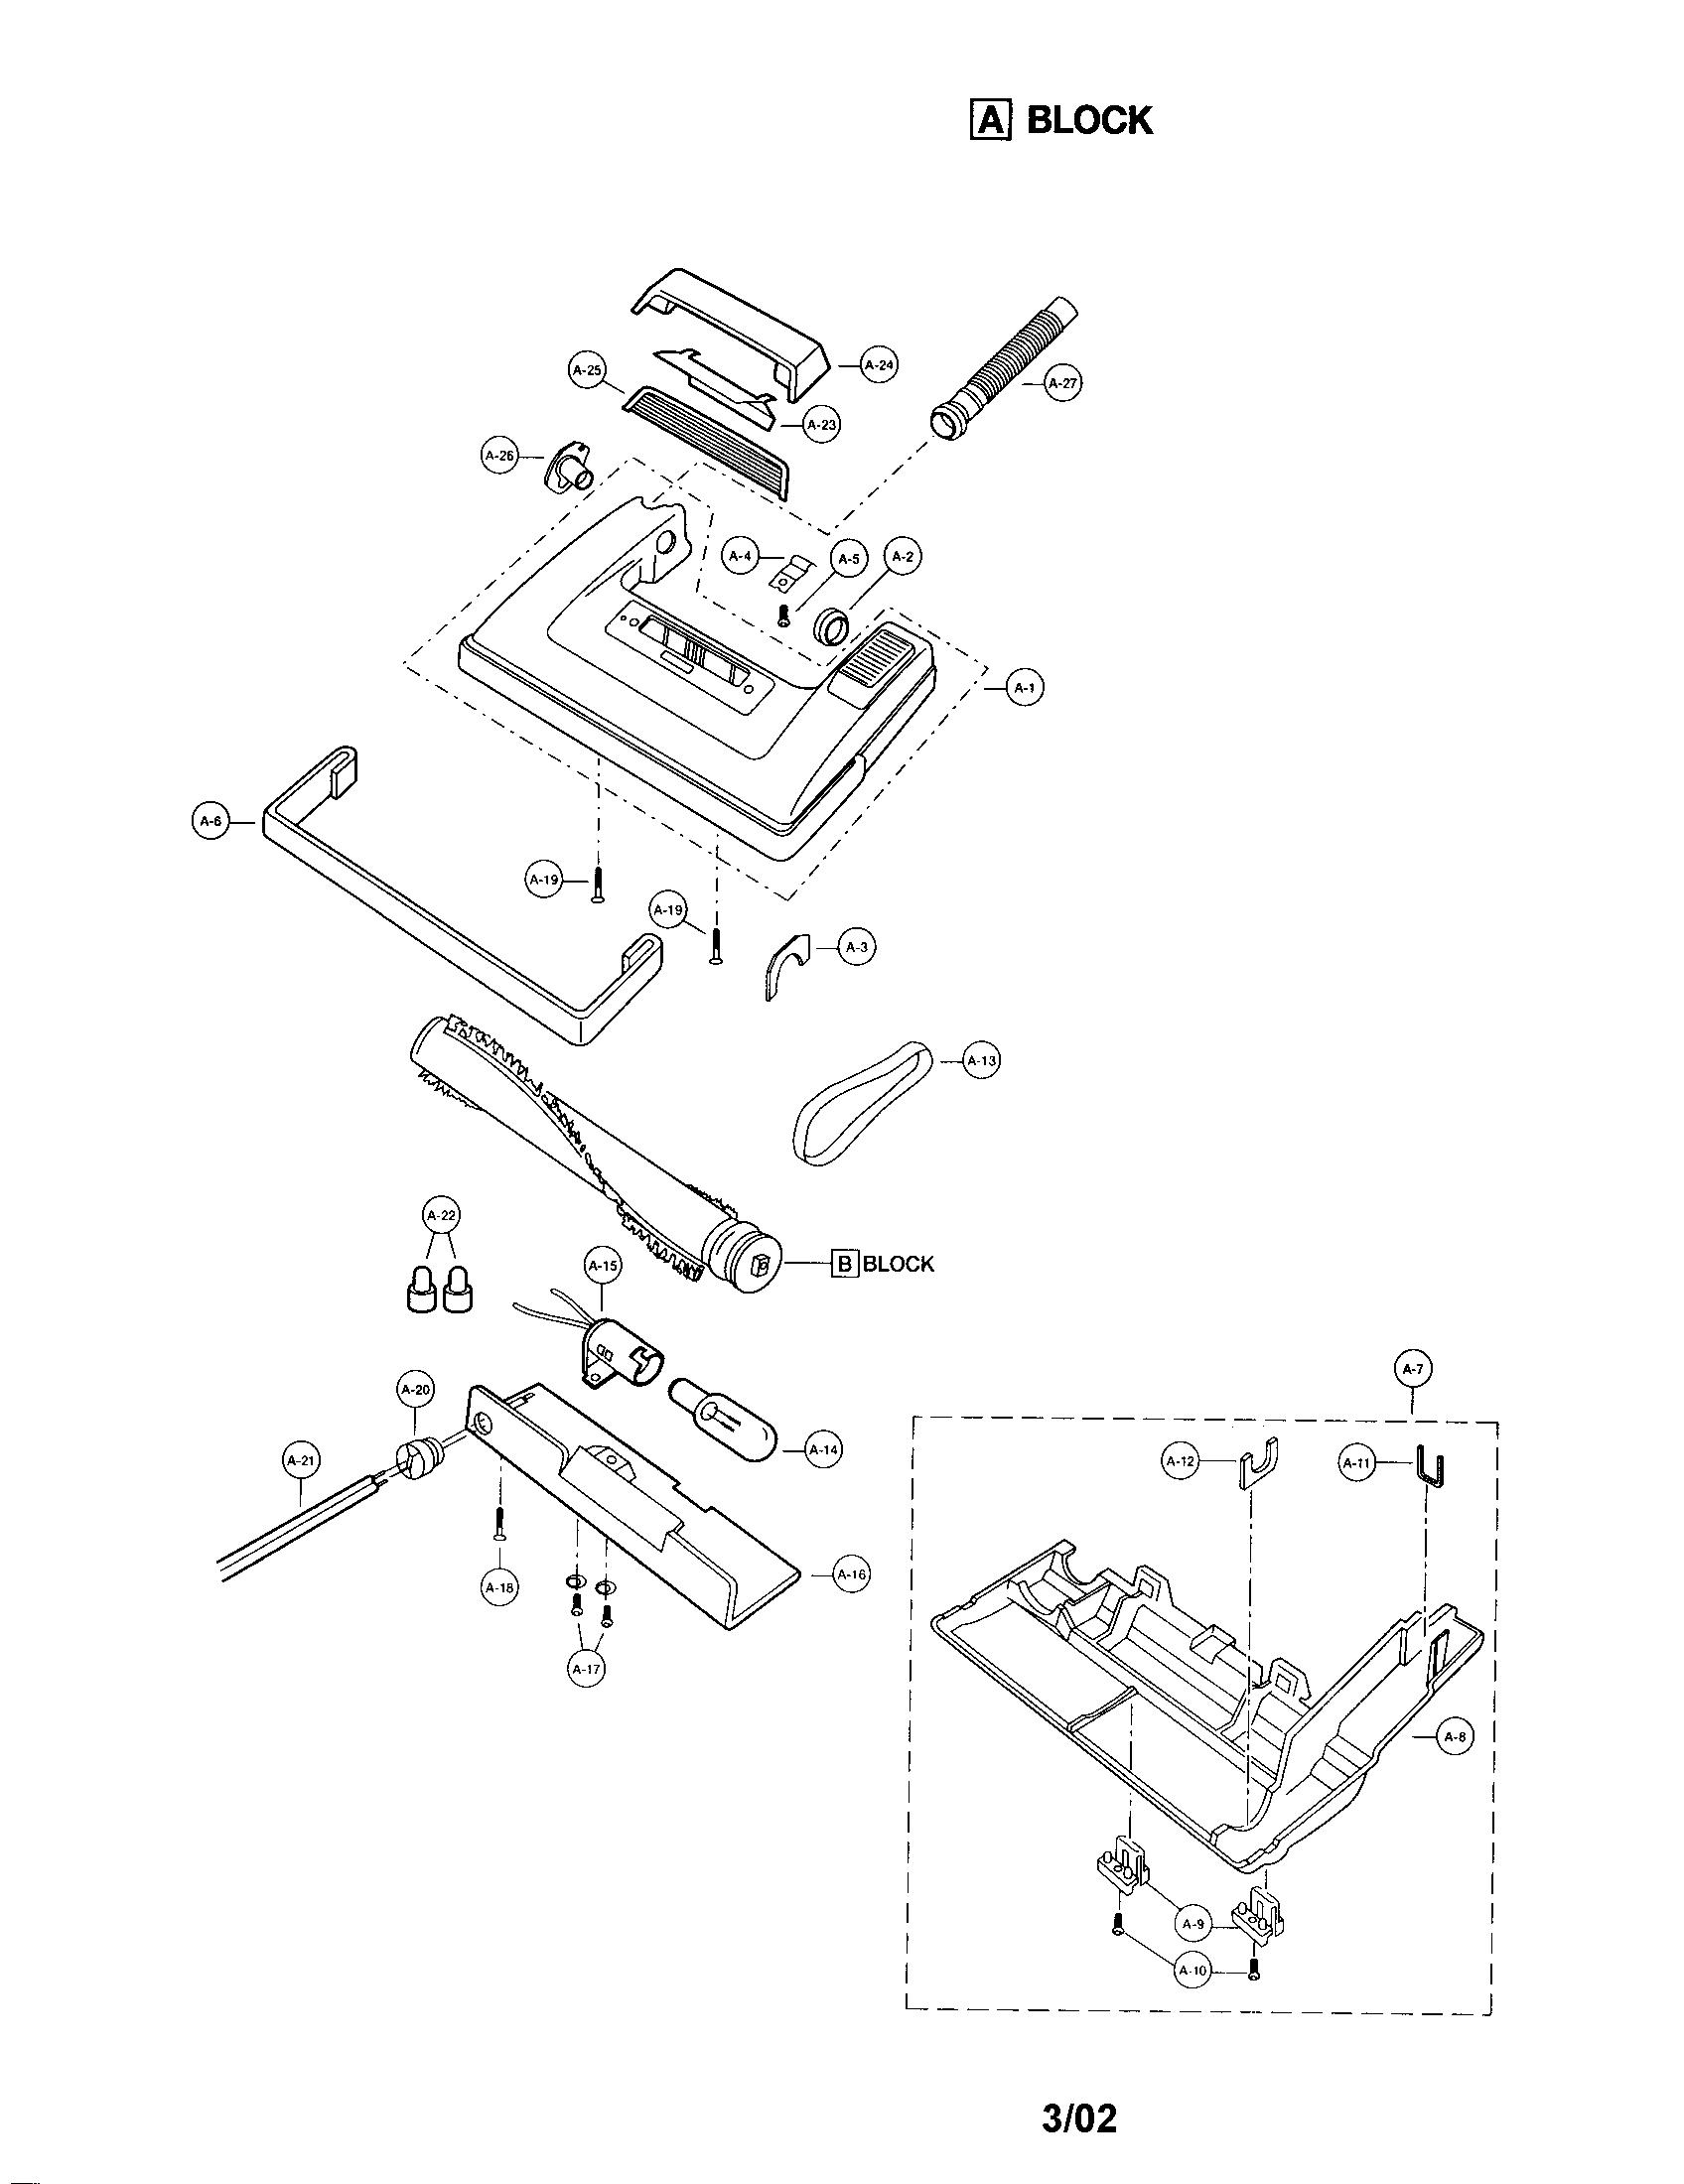 Panasonic vacuum on Shoppinder